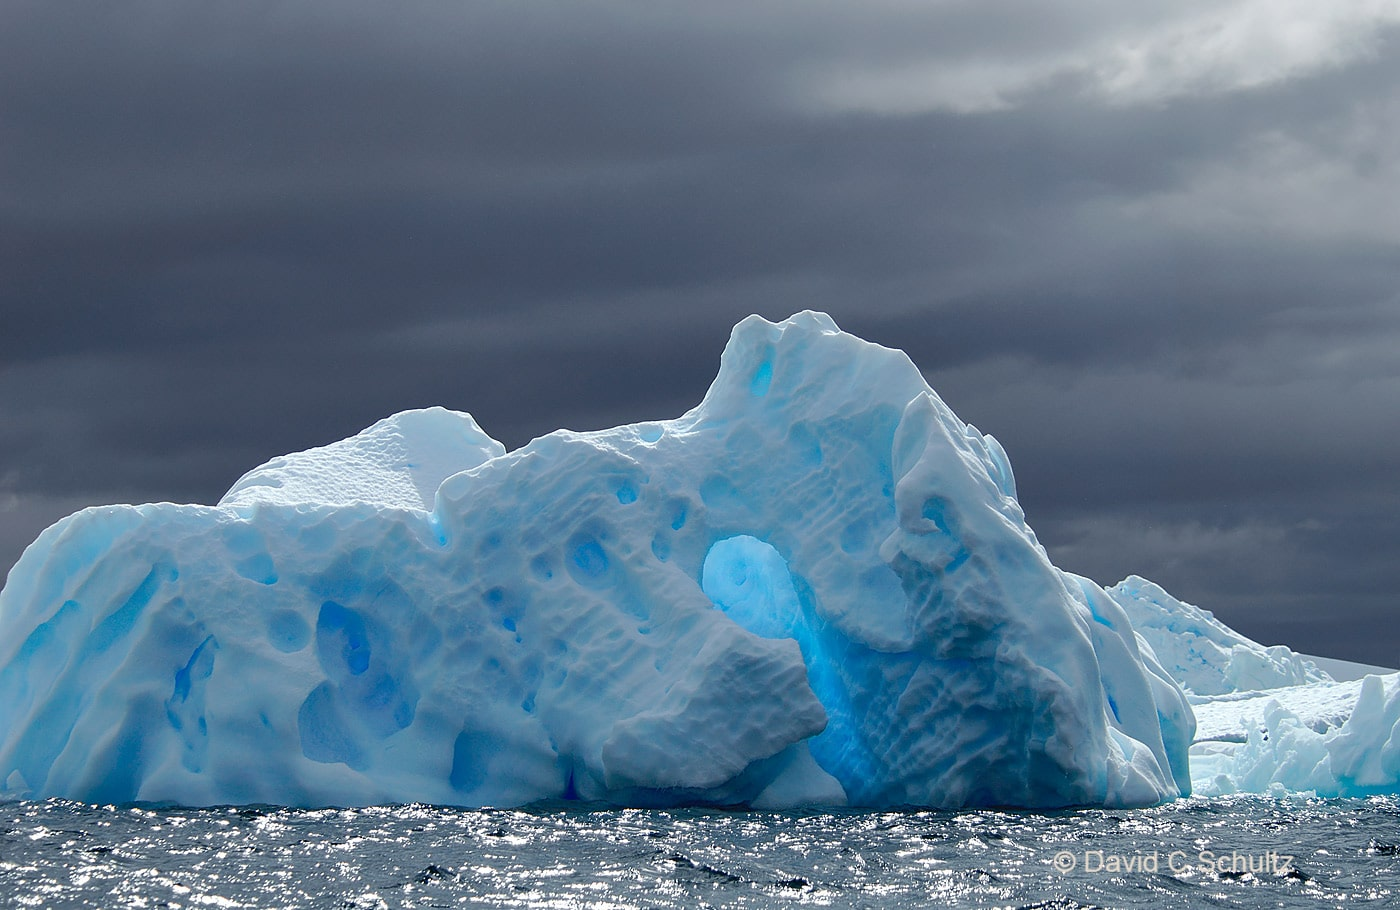 Iceberg in Antarctica - Image #167-131